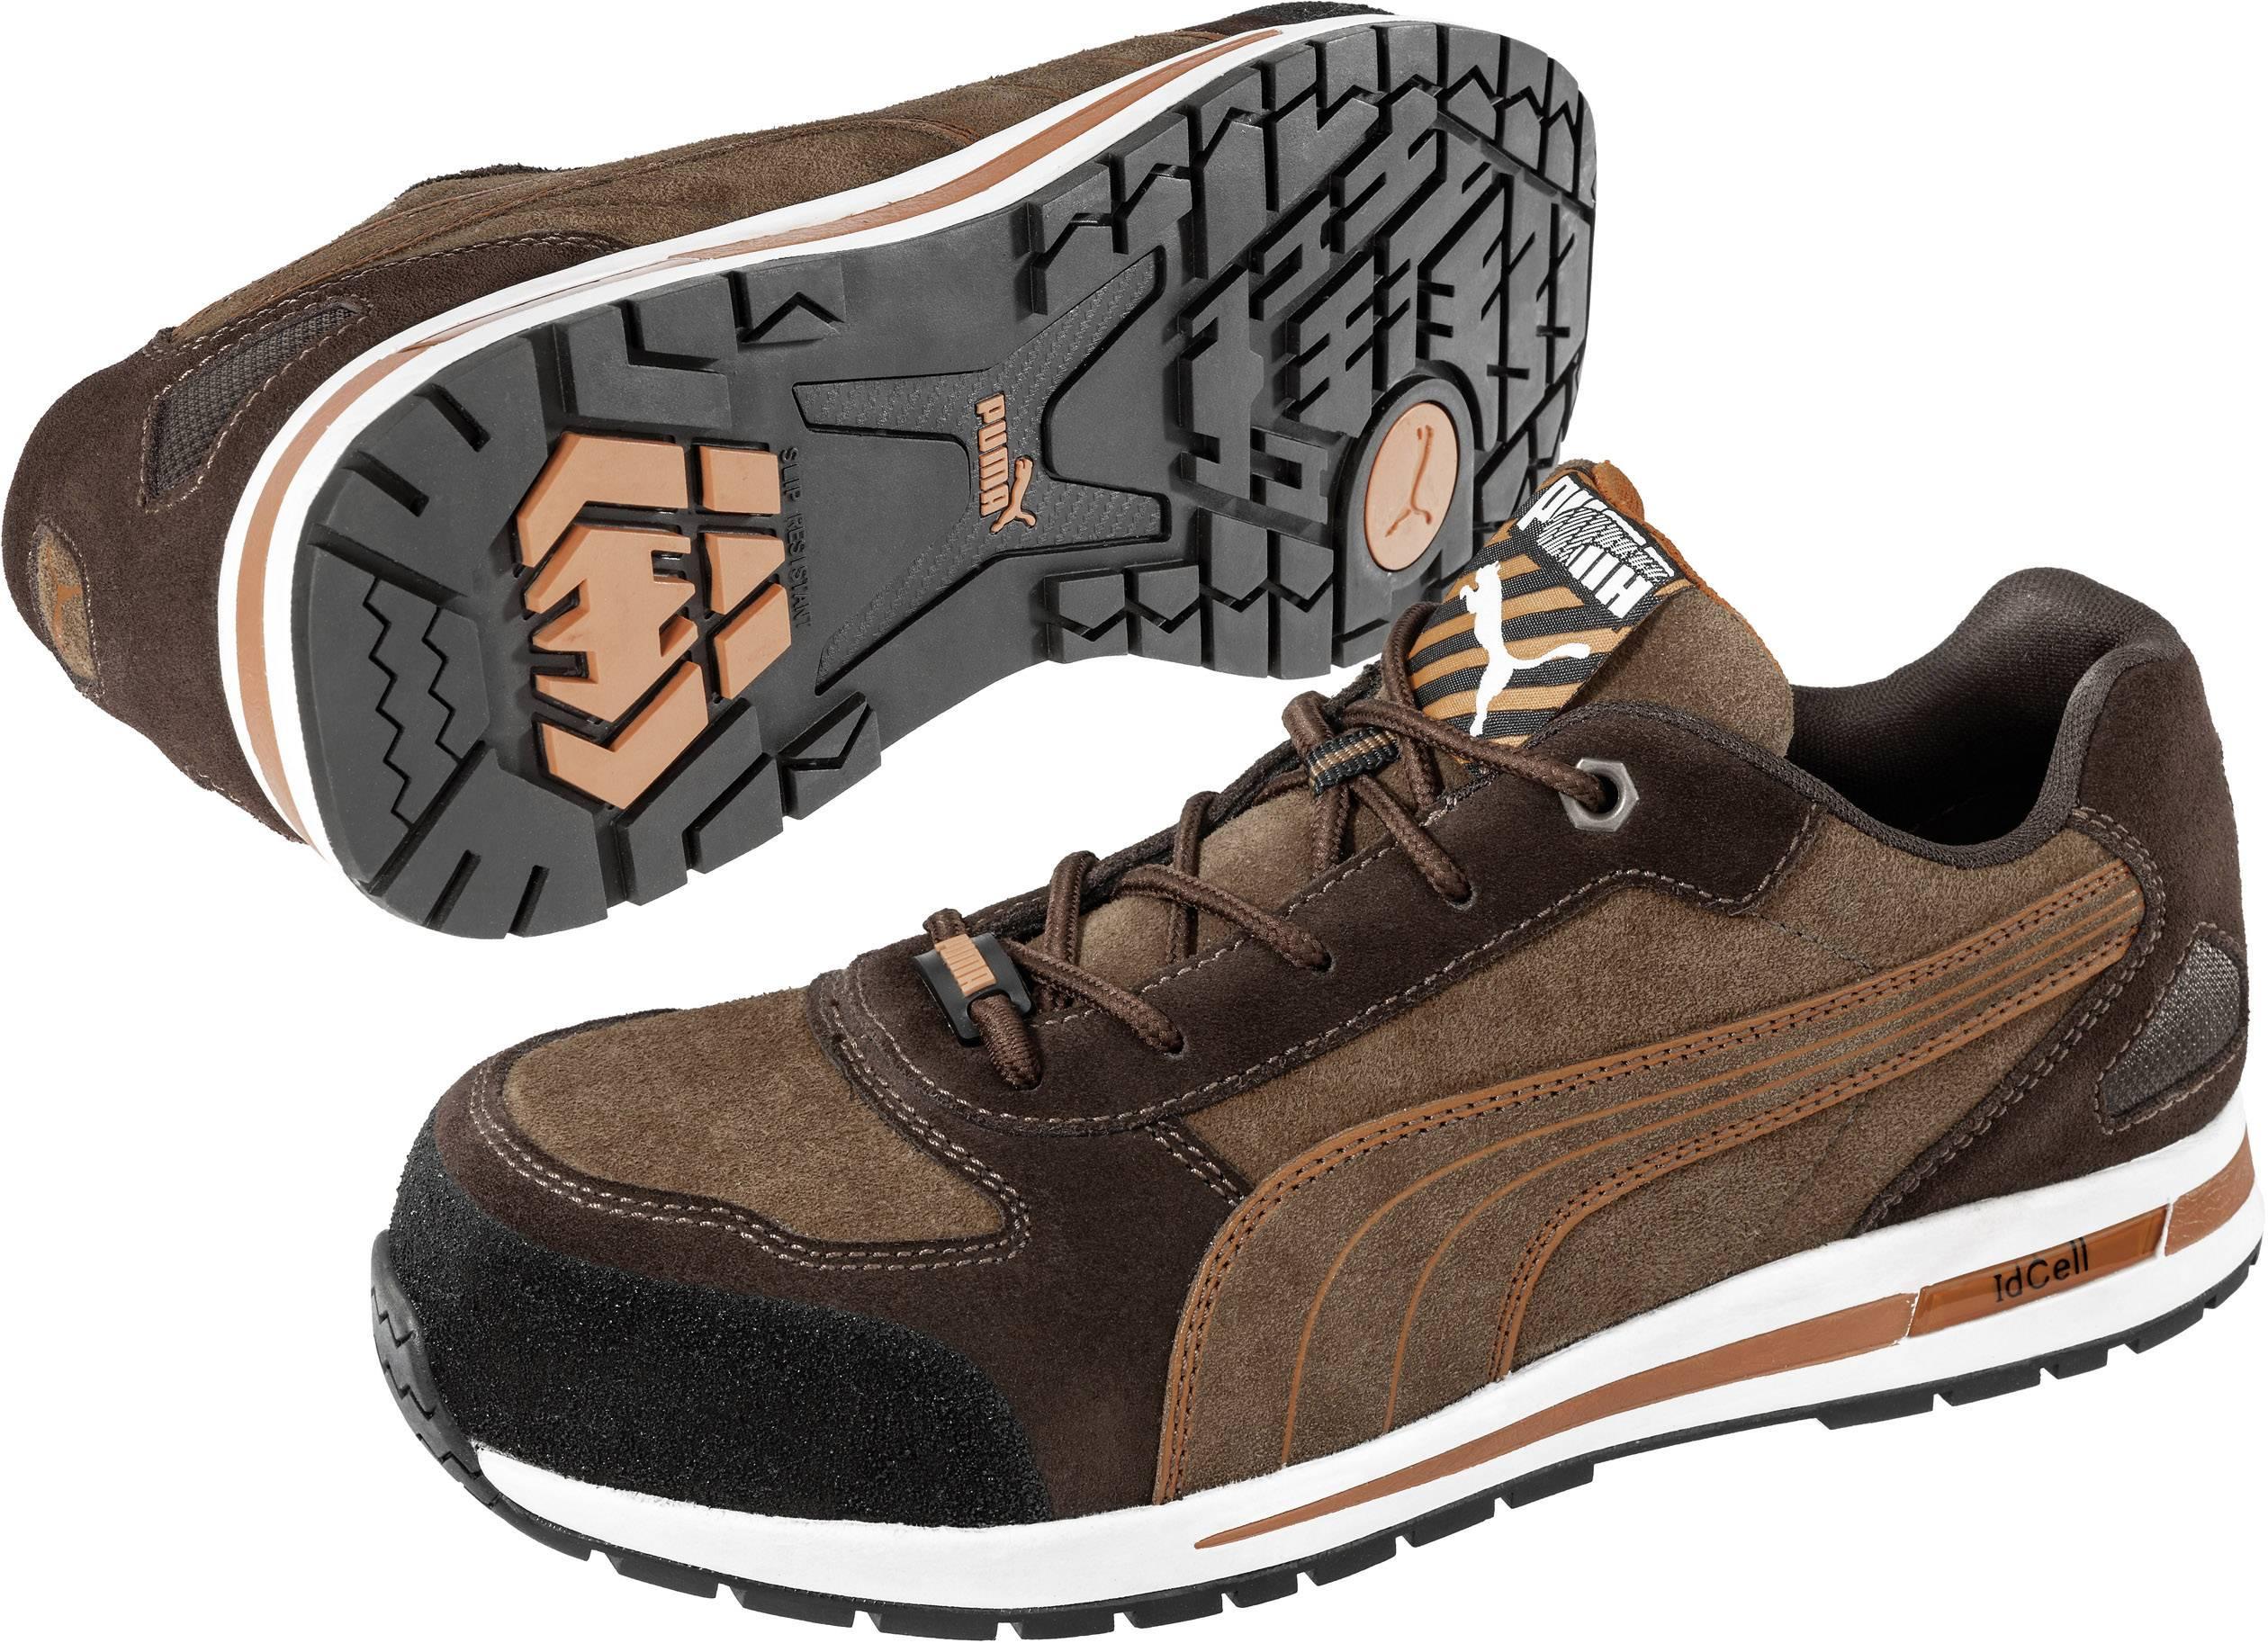 prix le plus bas c1c42 02591 Protective footwear S1P Size: 45 Brown PUMA Safety Barani ...